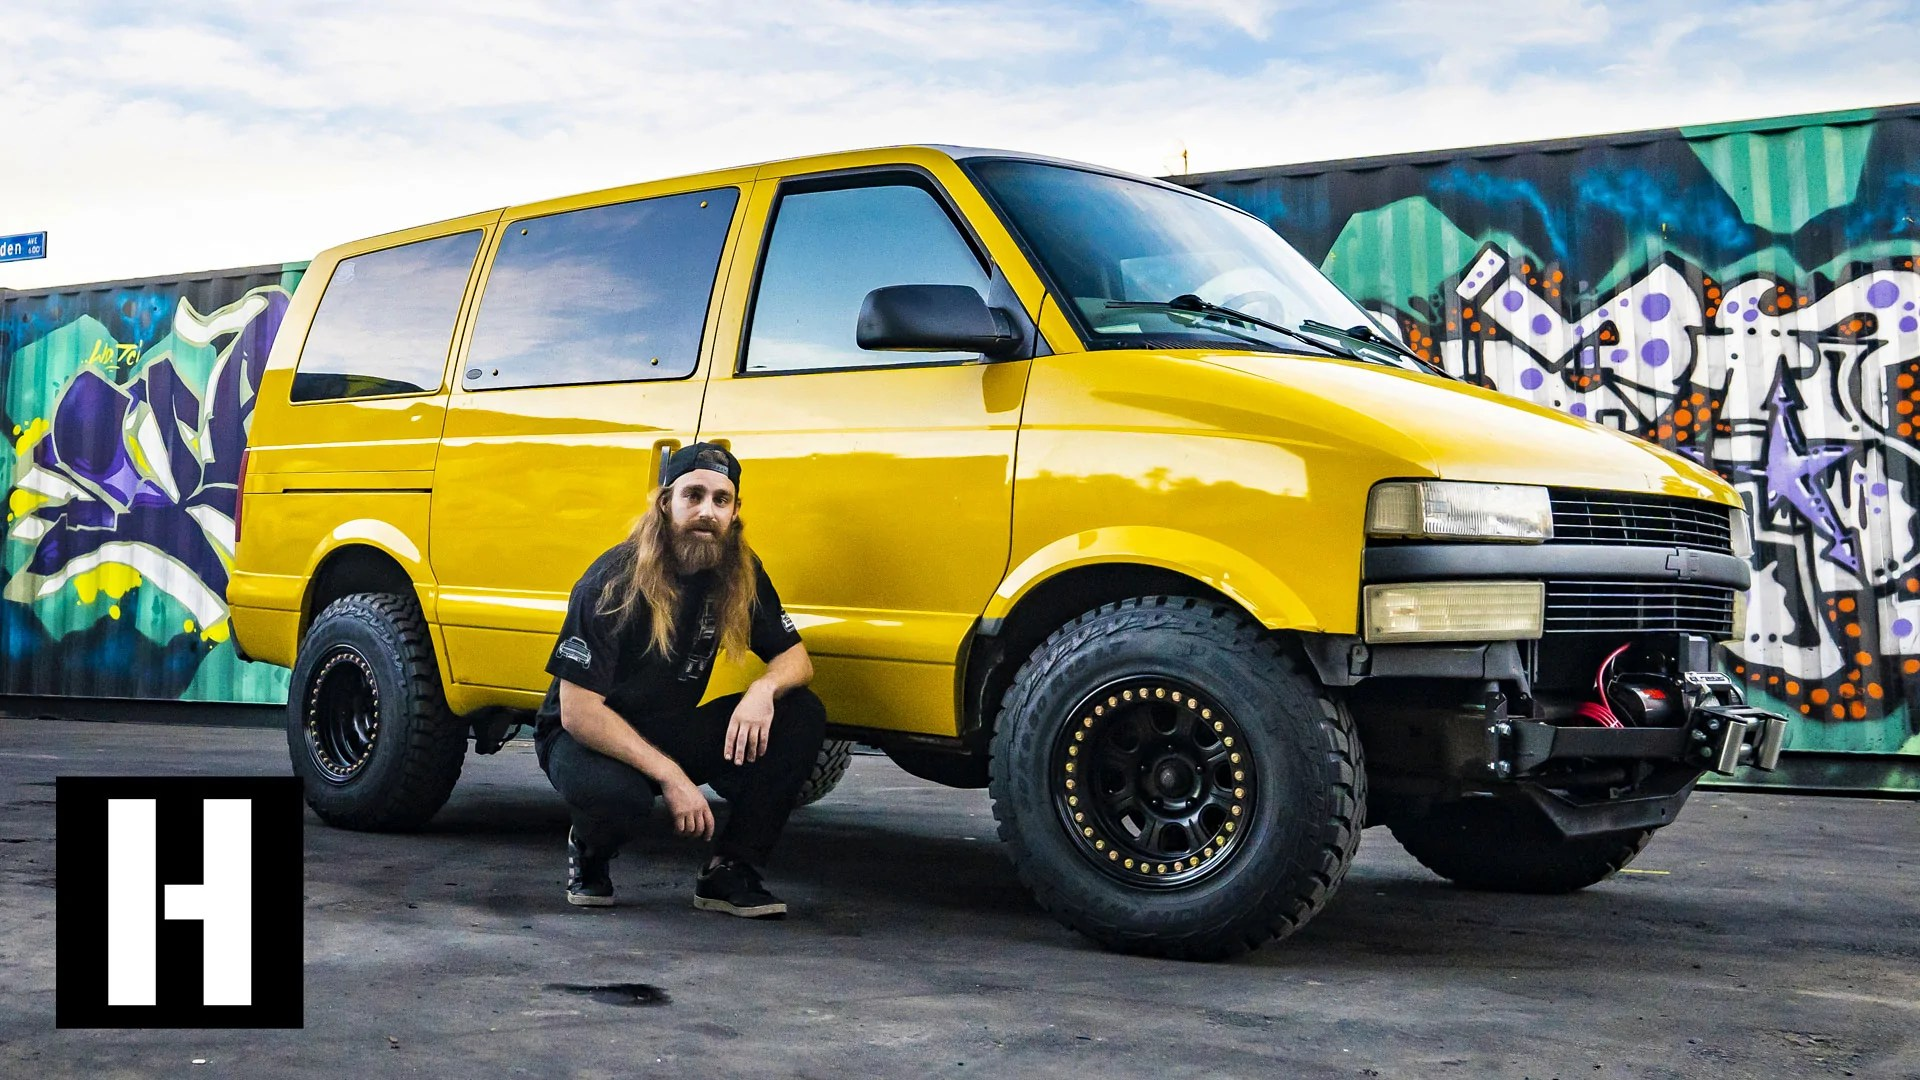 astro van to badasstro van our shreditor kyle s daily gets the safari hoonigan [ 1920 x 1080 Pixel ]